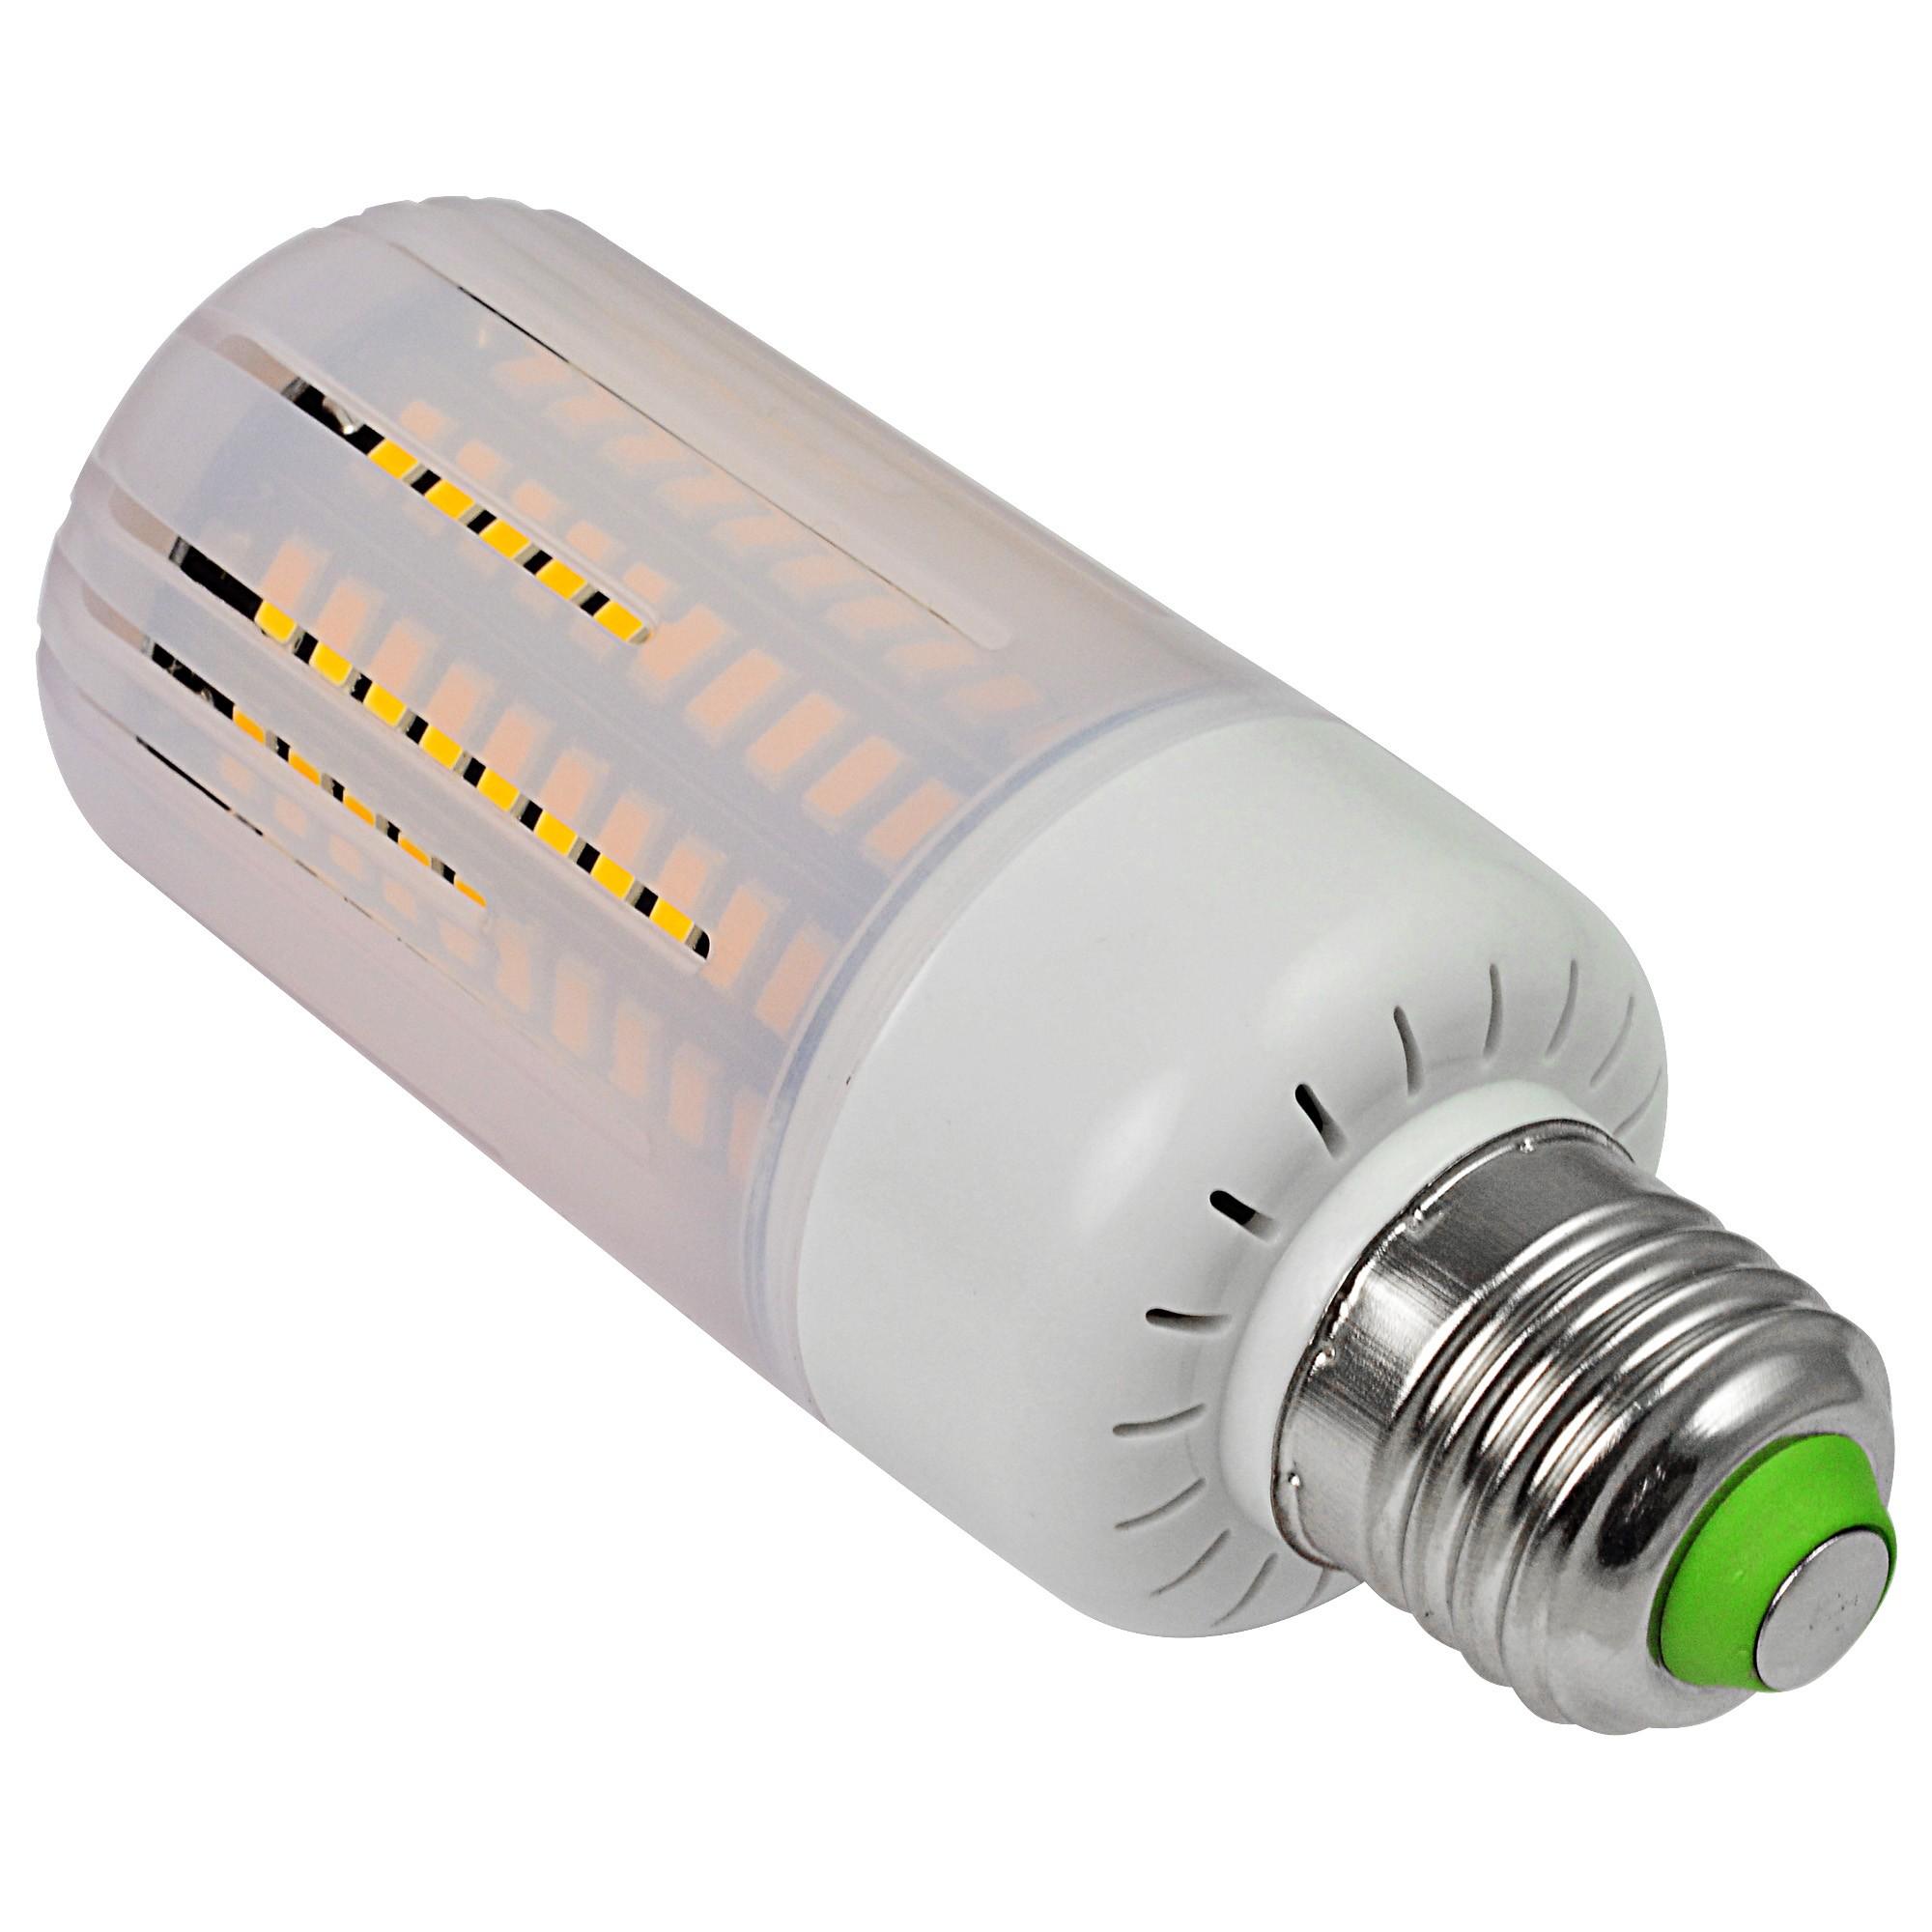 mengsled mengs anti strobe e27 15w led corn light 120x 5736 smd lb led bulb lamp in warm. Black Bedroom Furniture Sets. Home Design Ideas